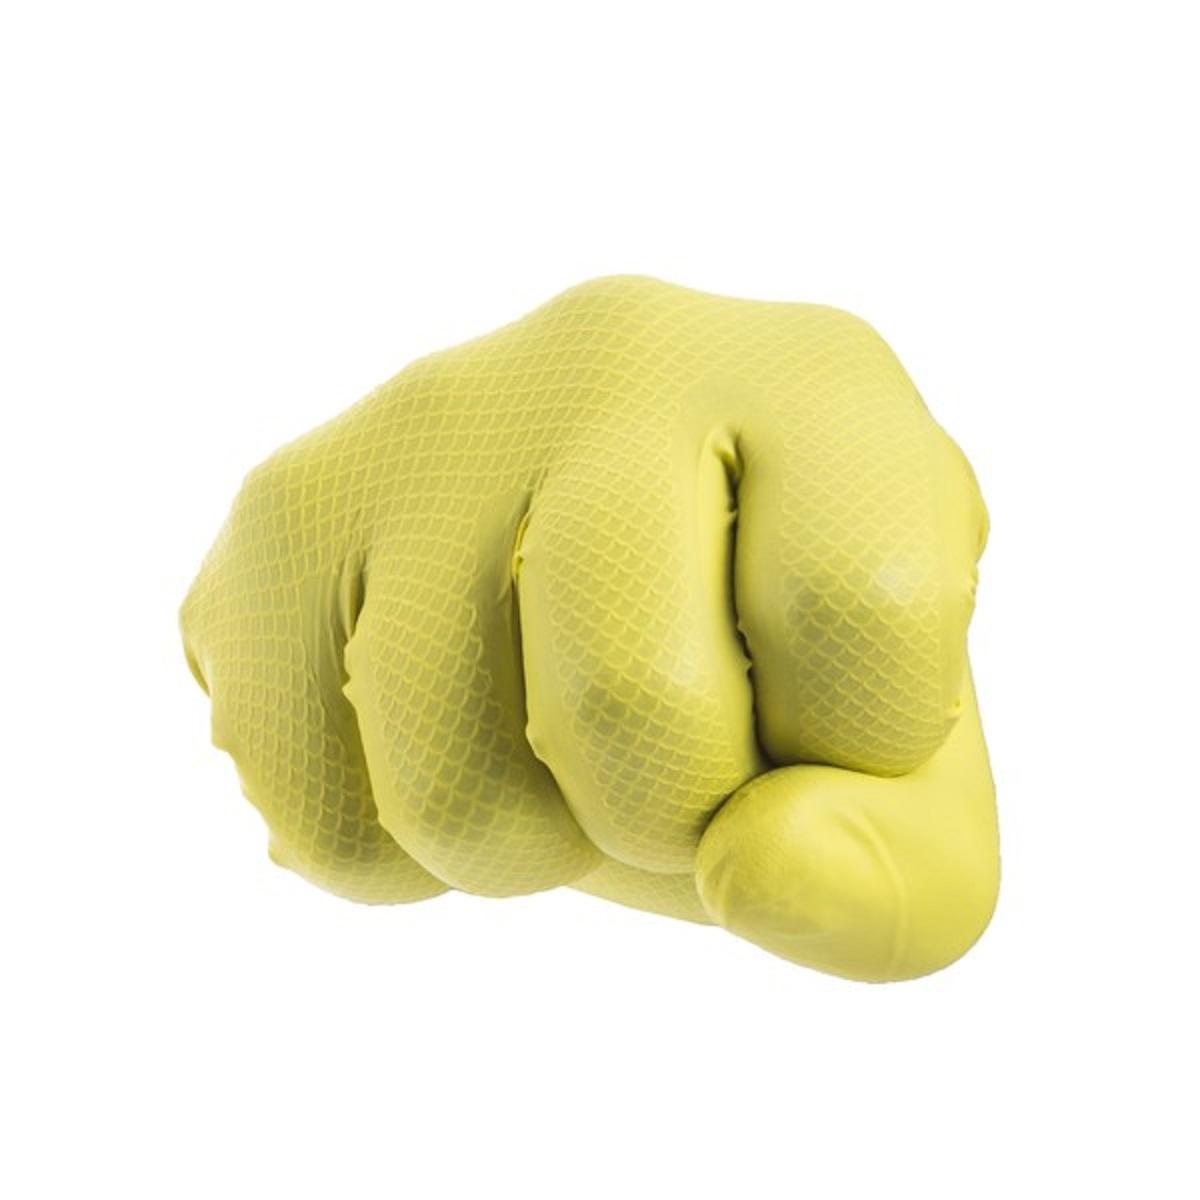 Luva SuperGlove Nitro Hipoalergênica Antiderrapante de Alta Resistência - Super Safety